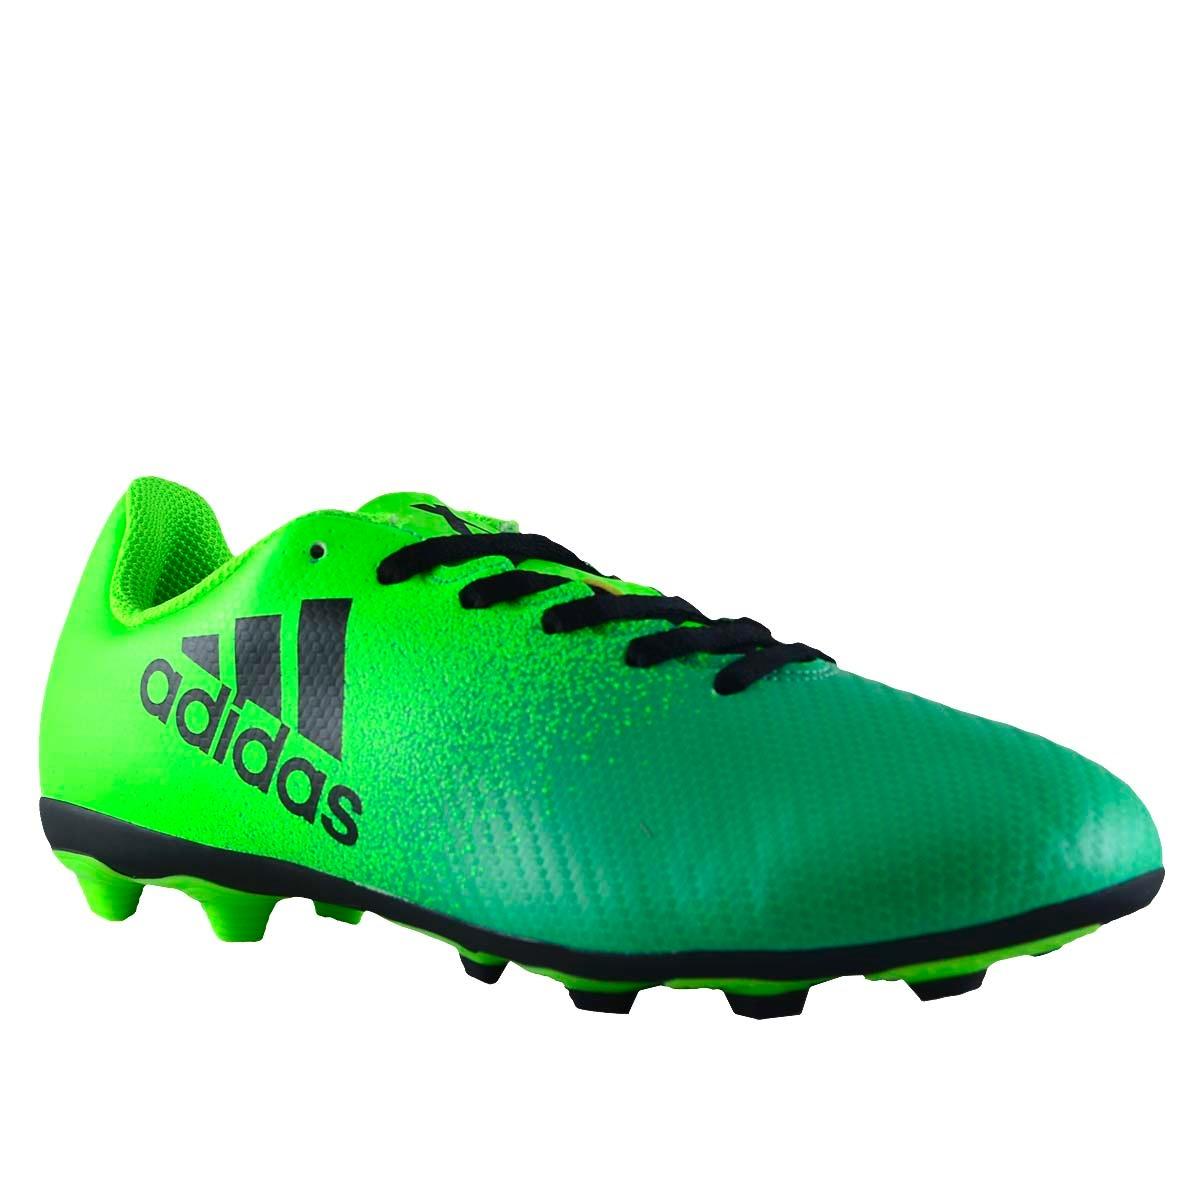 Botines adidas X 16.4 Suelo Firme Niños Verde -   1.250 81f0150849d5f